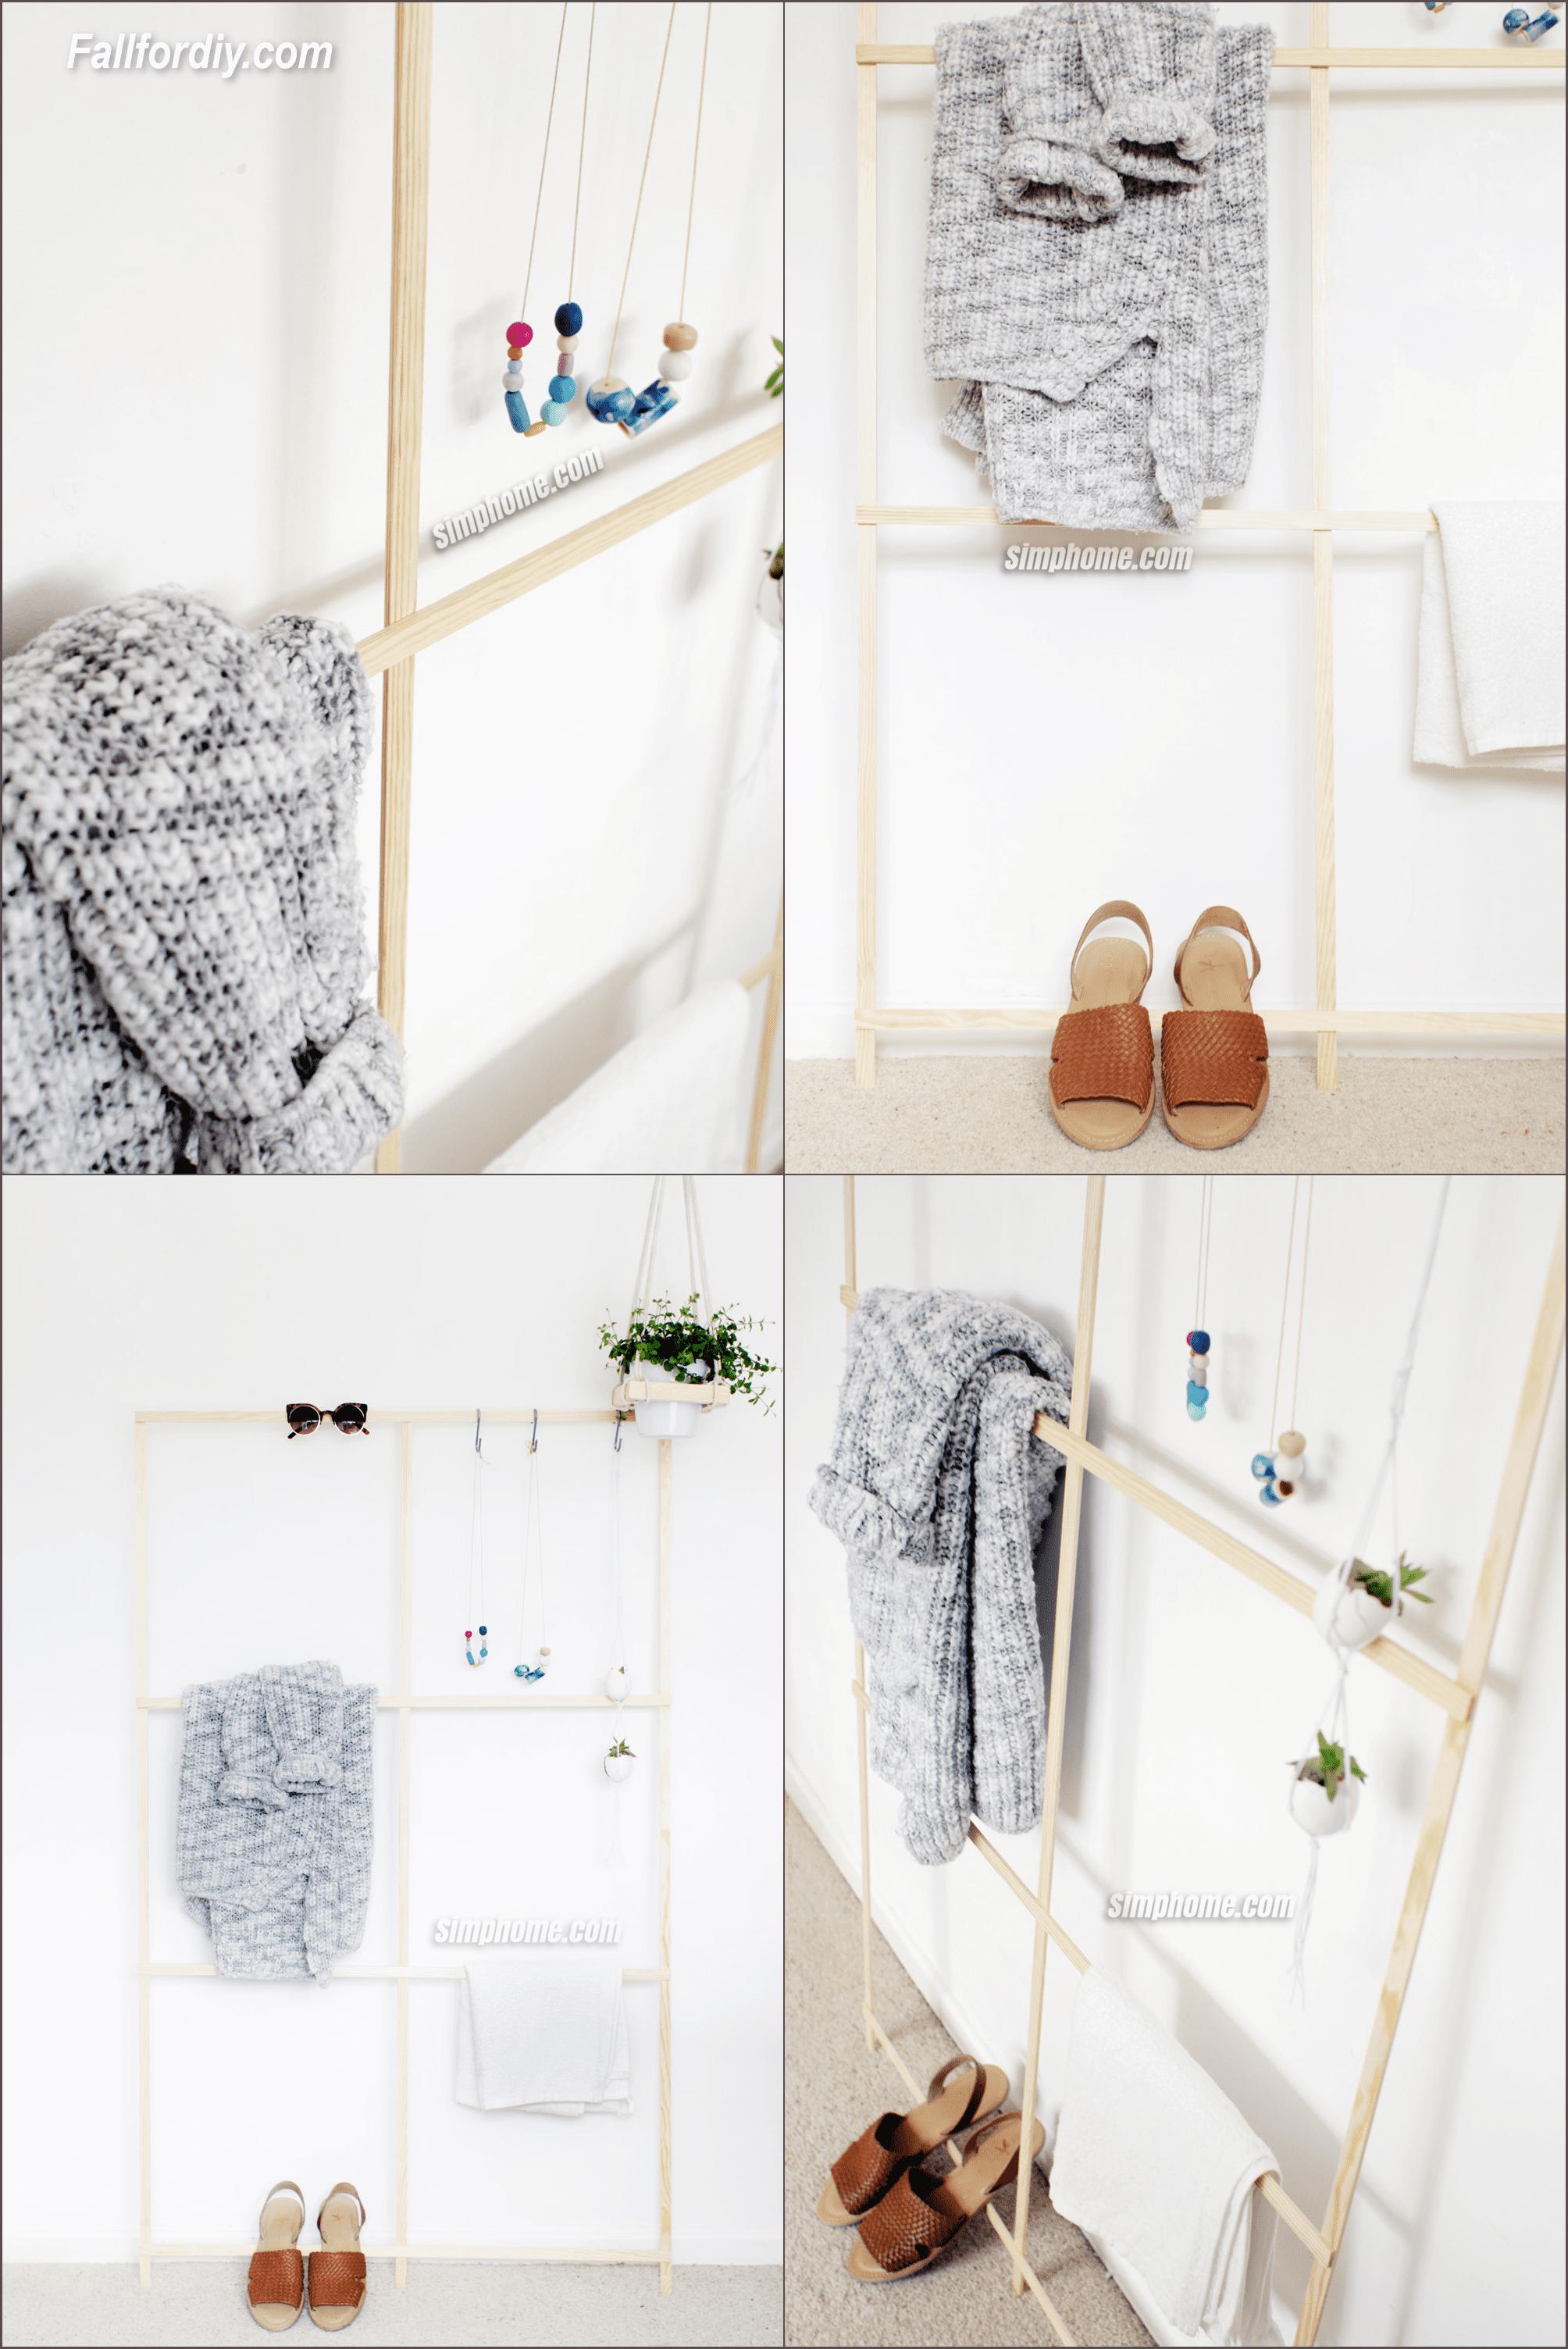 5.Simphome.com DIY Trellis Clothes Rack